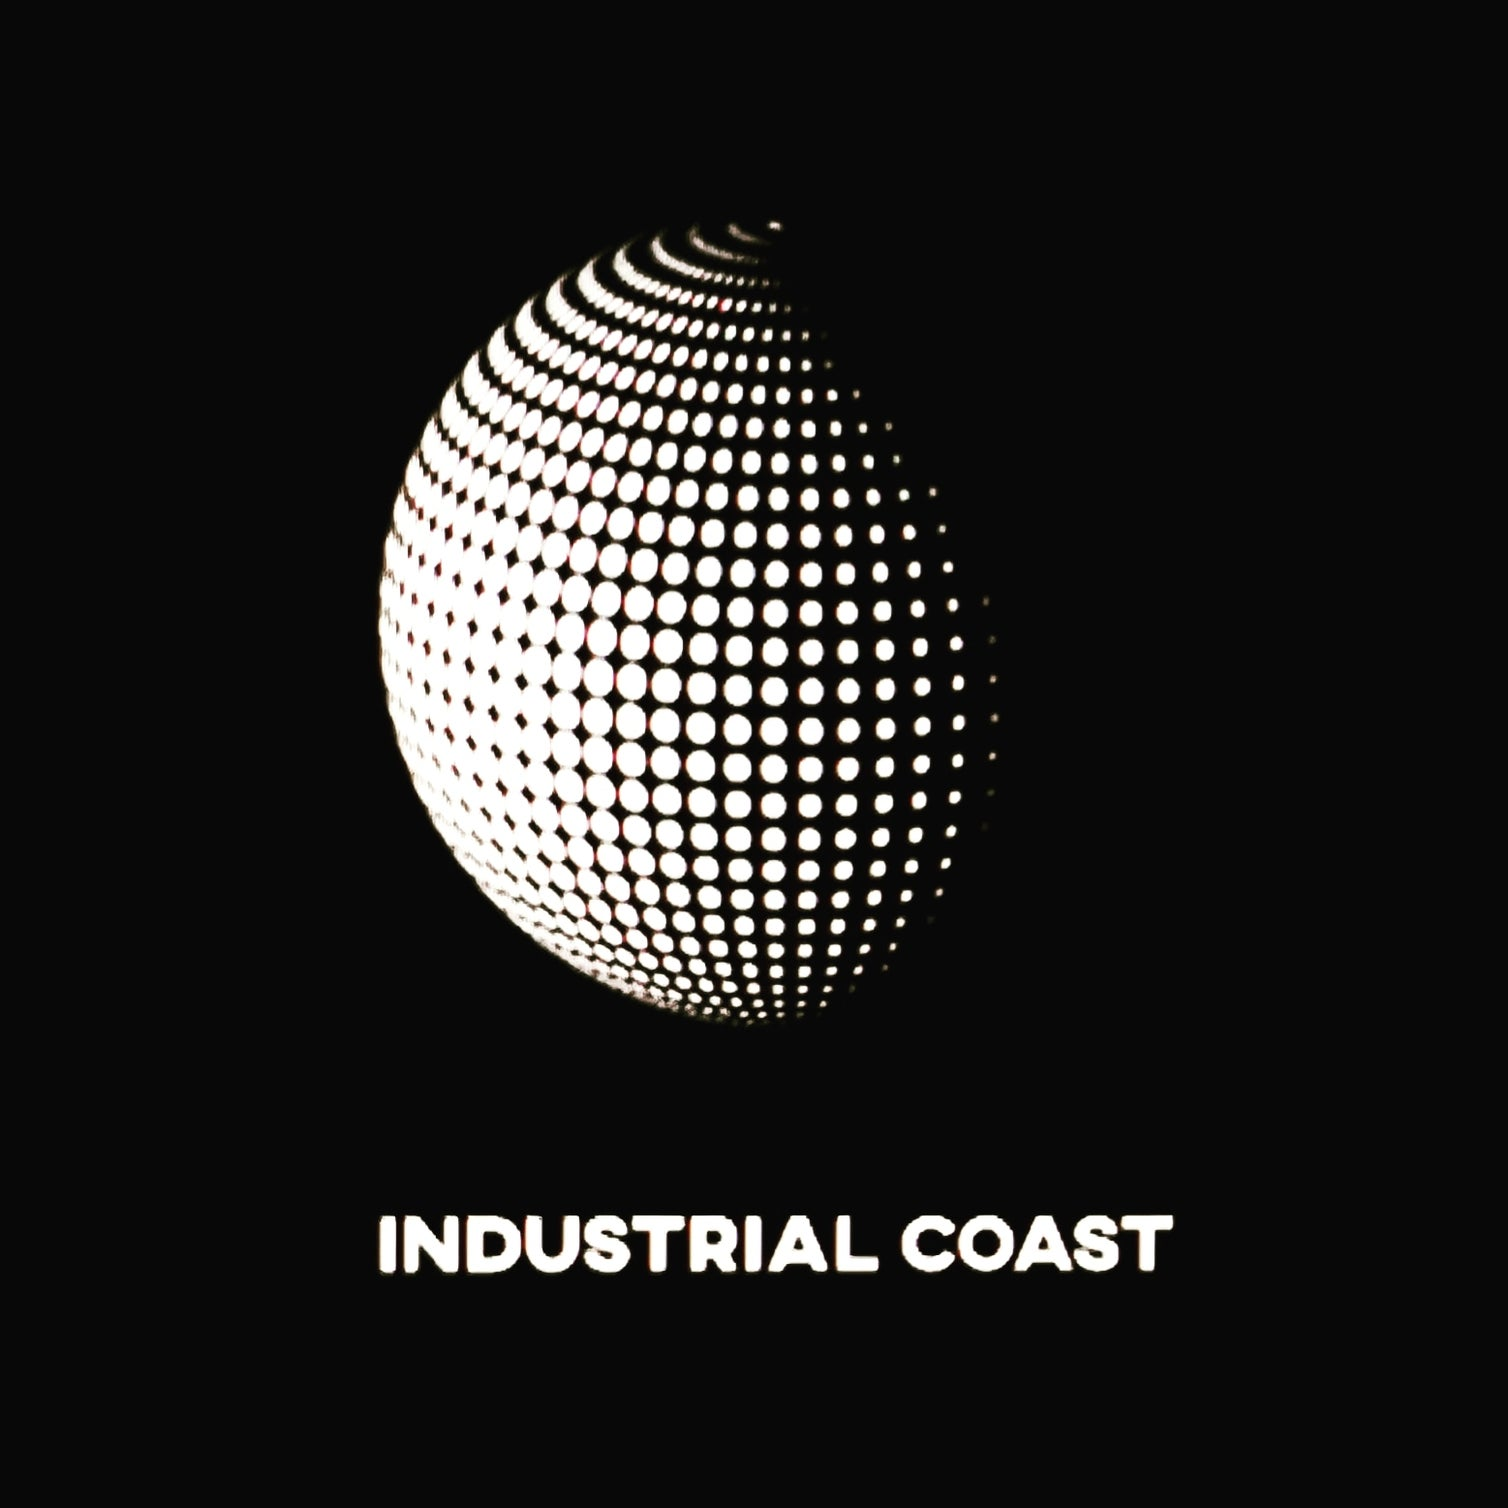 industrialcoast